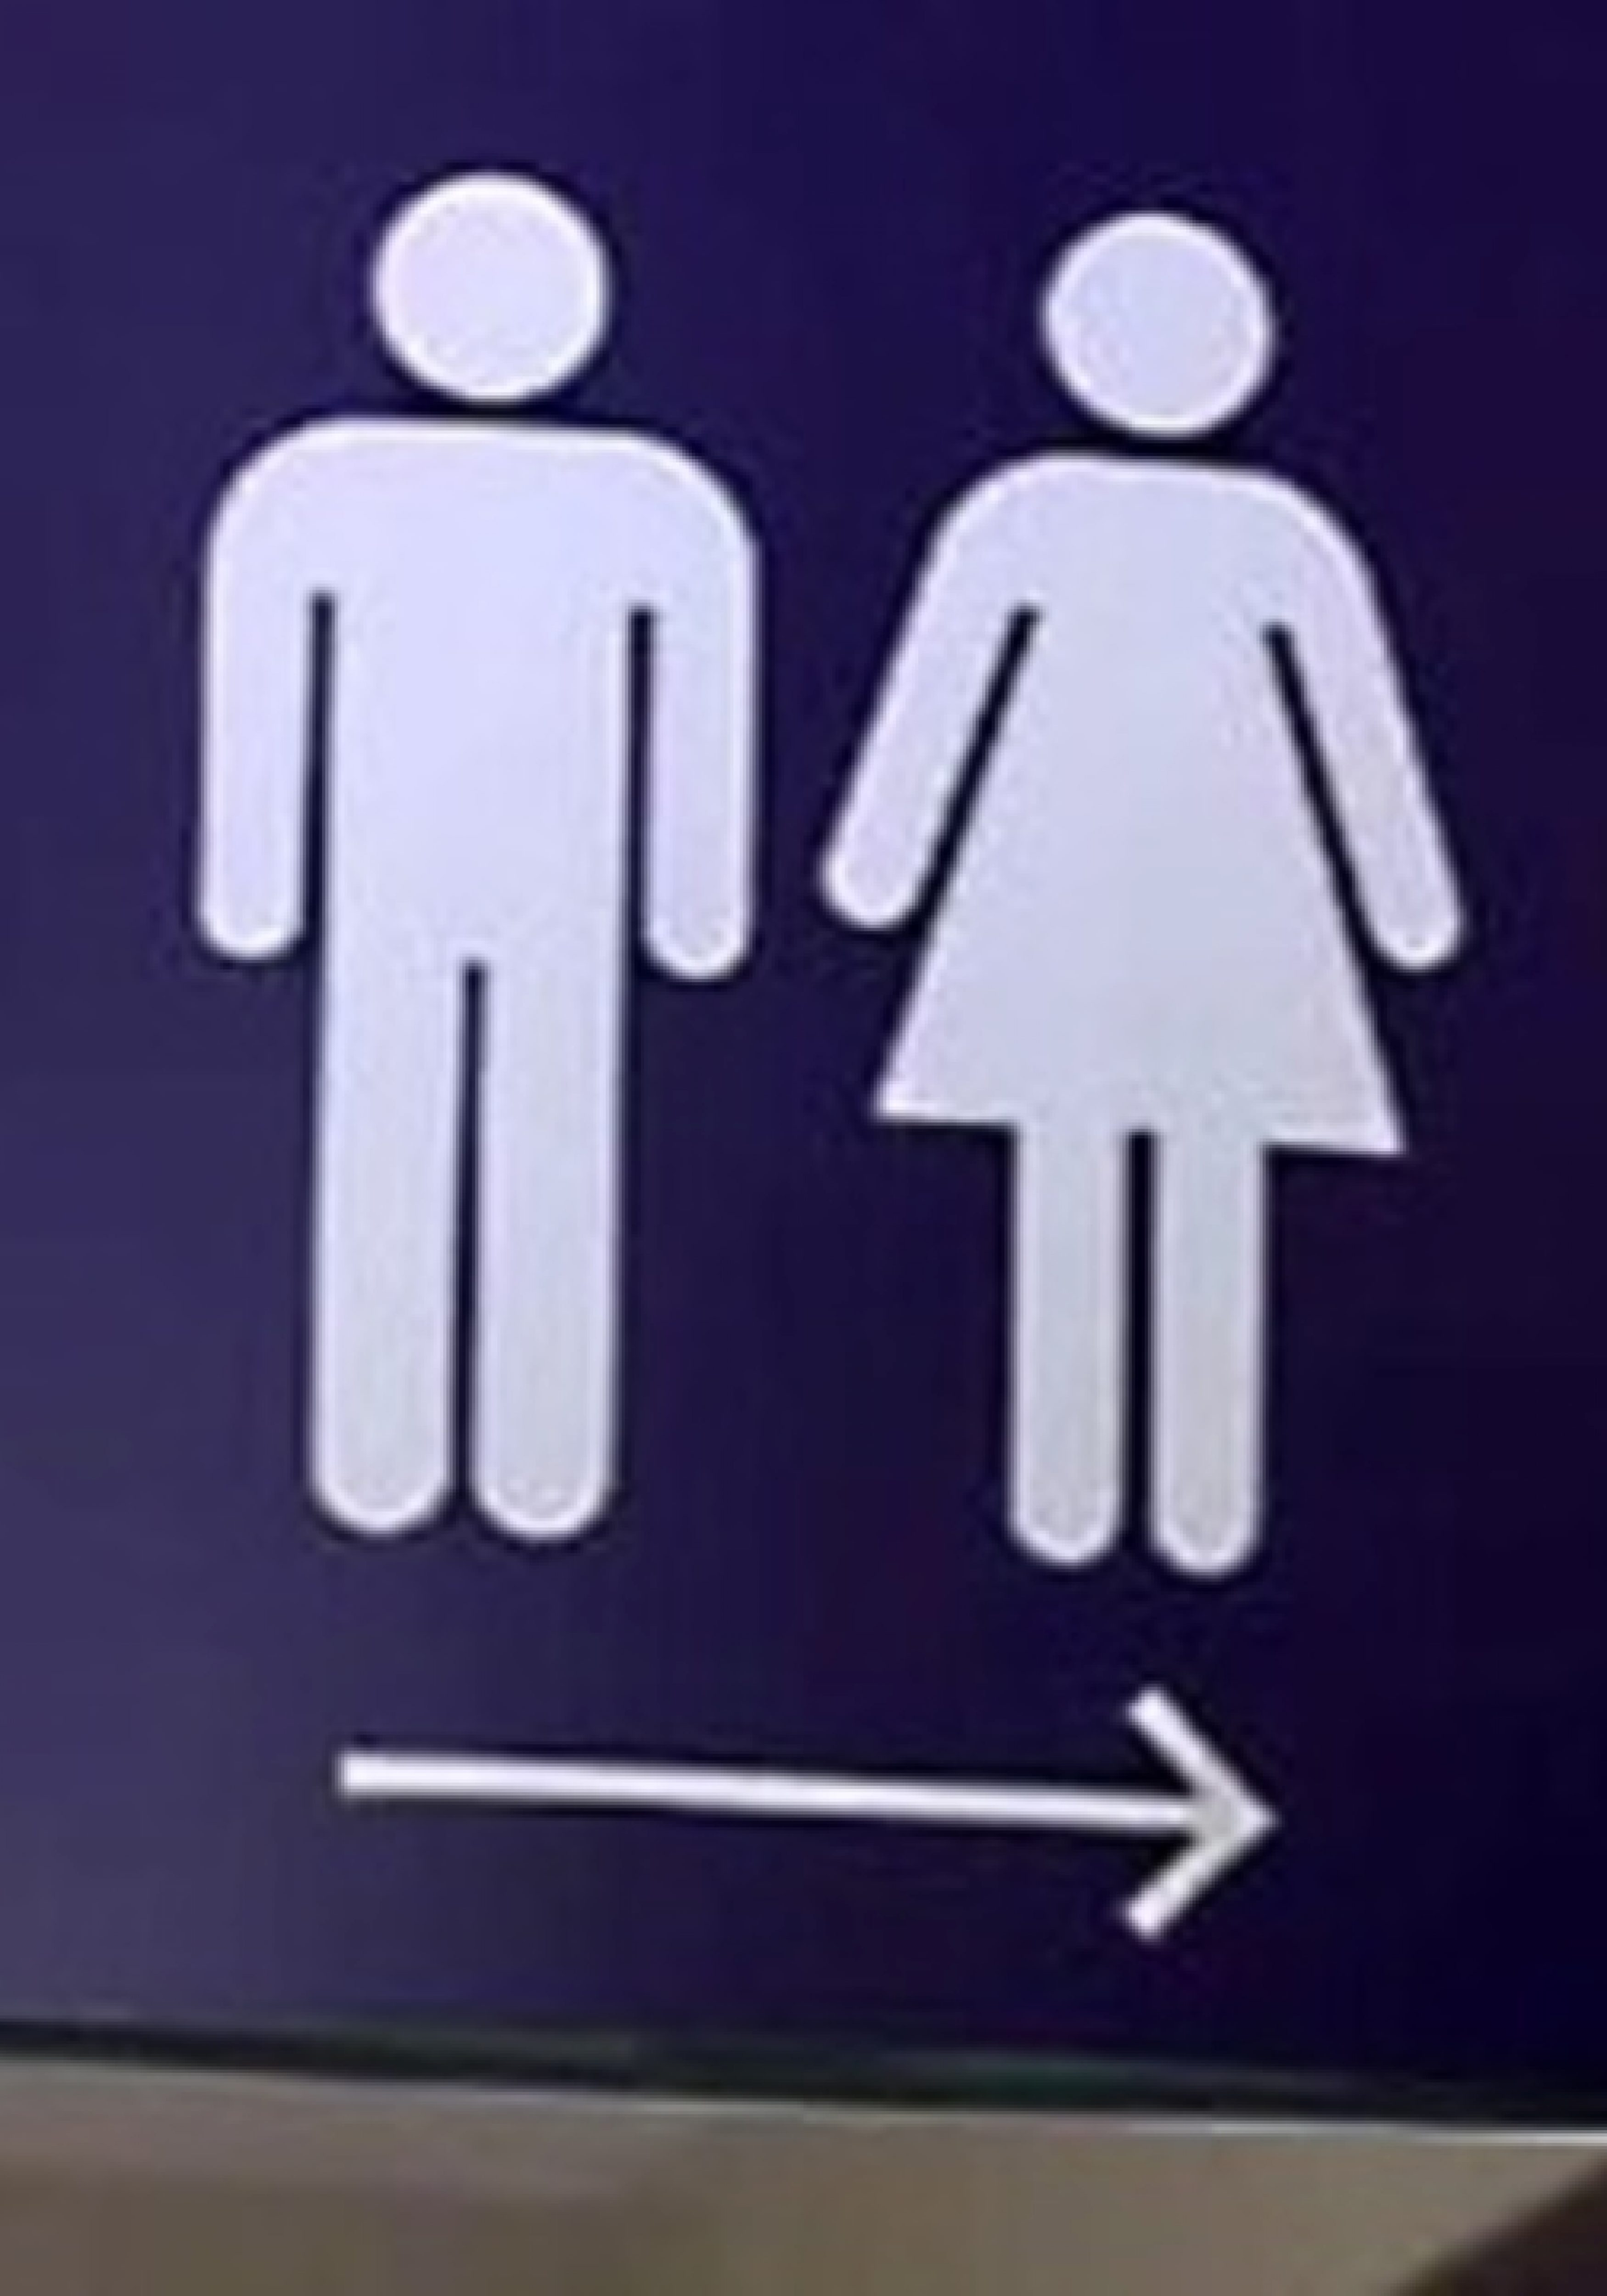 Bathroom-sign-JPG_2497930_ver1.0_1280_720-1-3500x5000.jpg